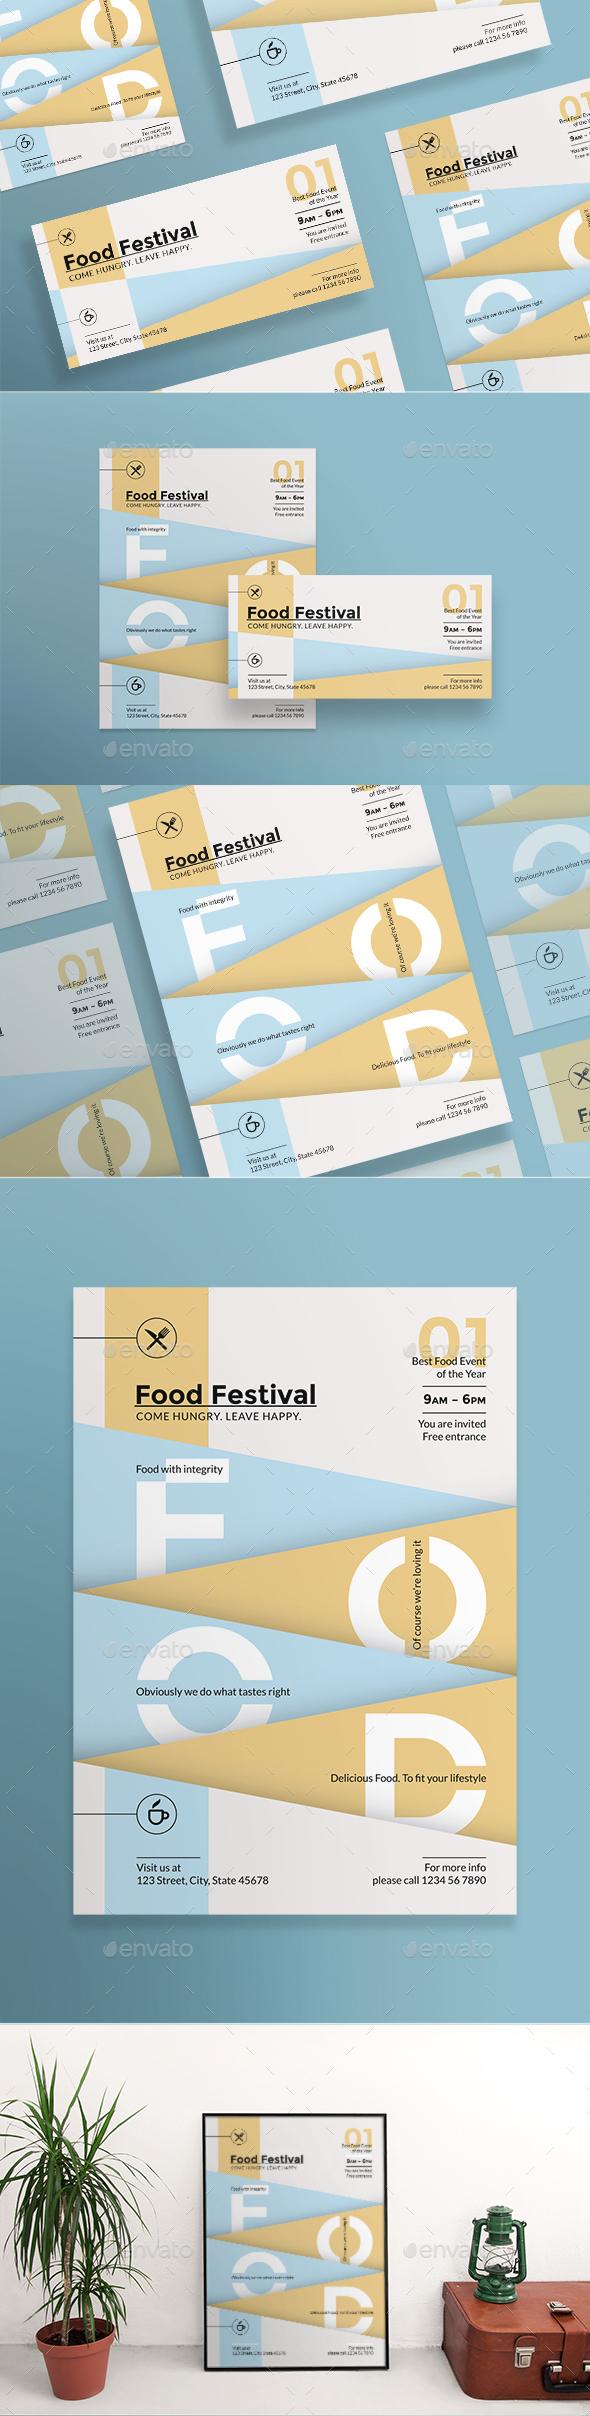 Food Festival Flyers - Restaurant Flyers